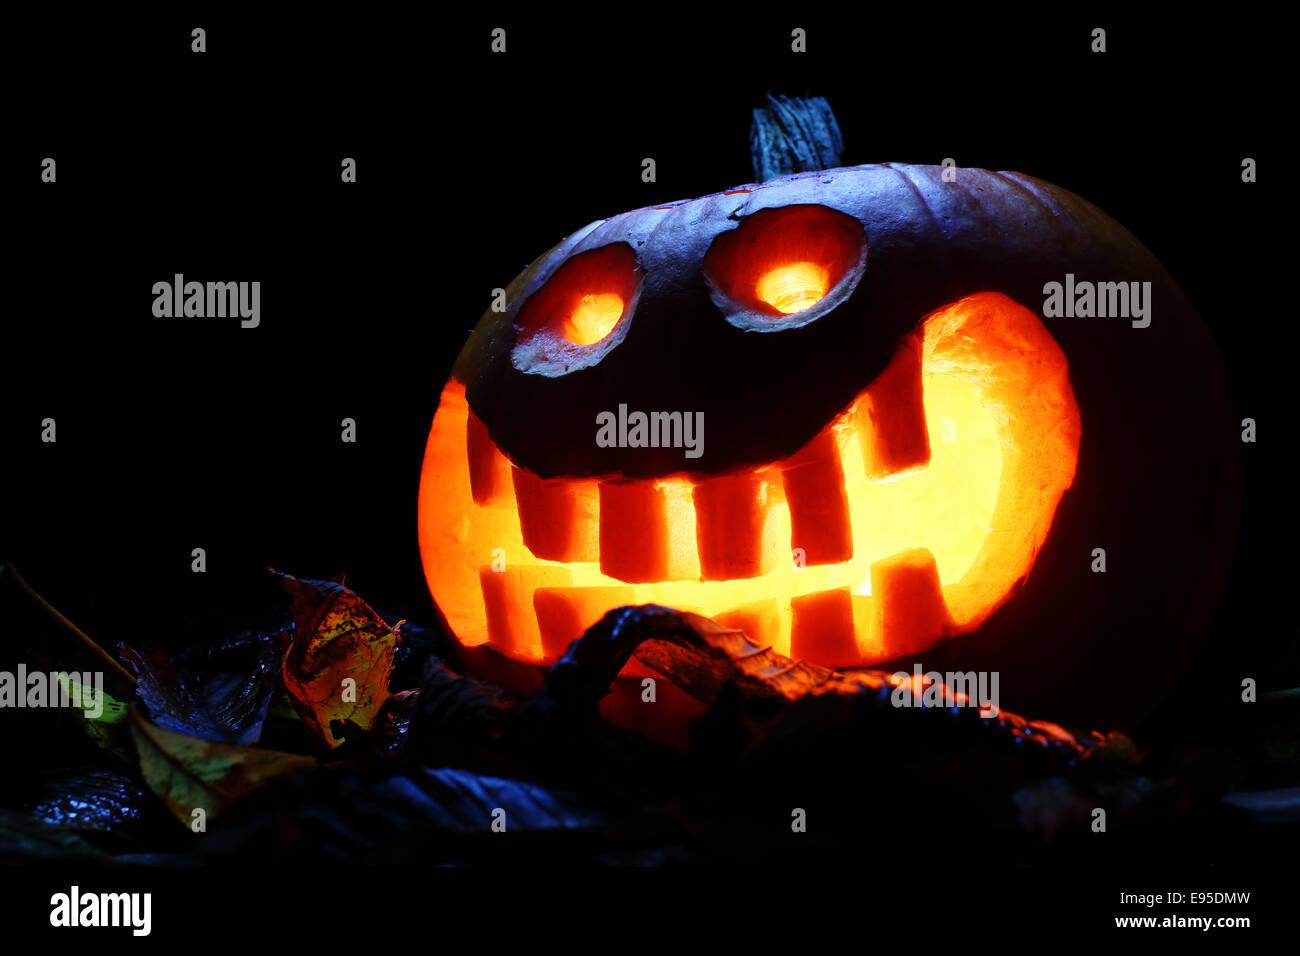 halloween-pumpkin-lantern-at-night-with-